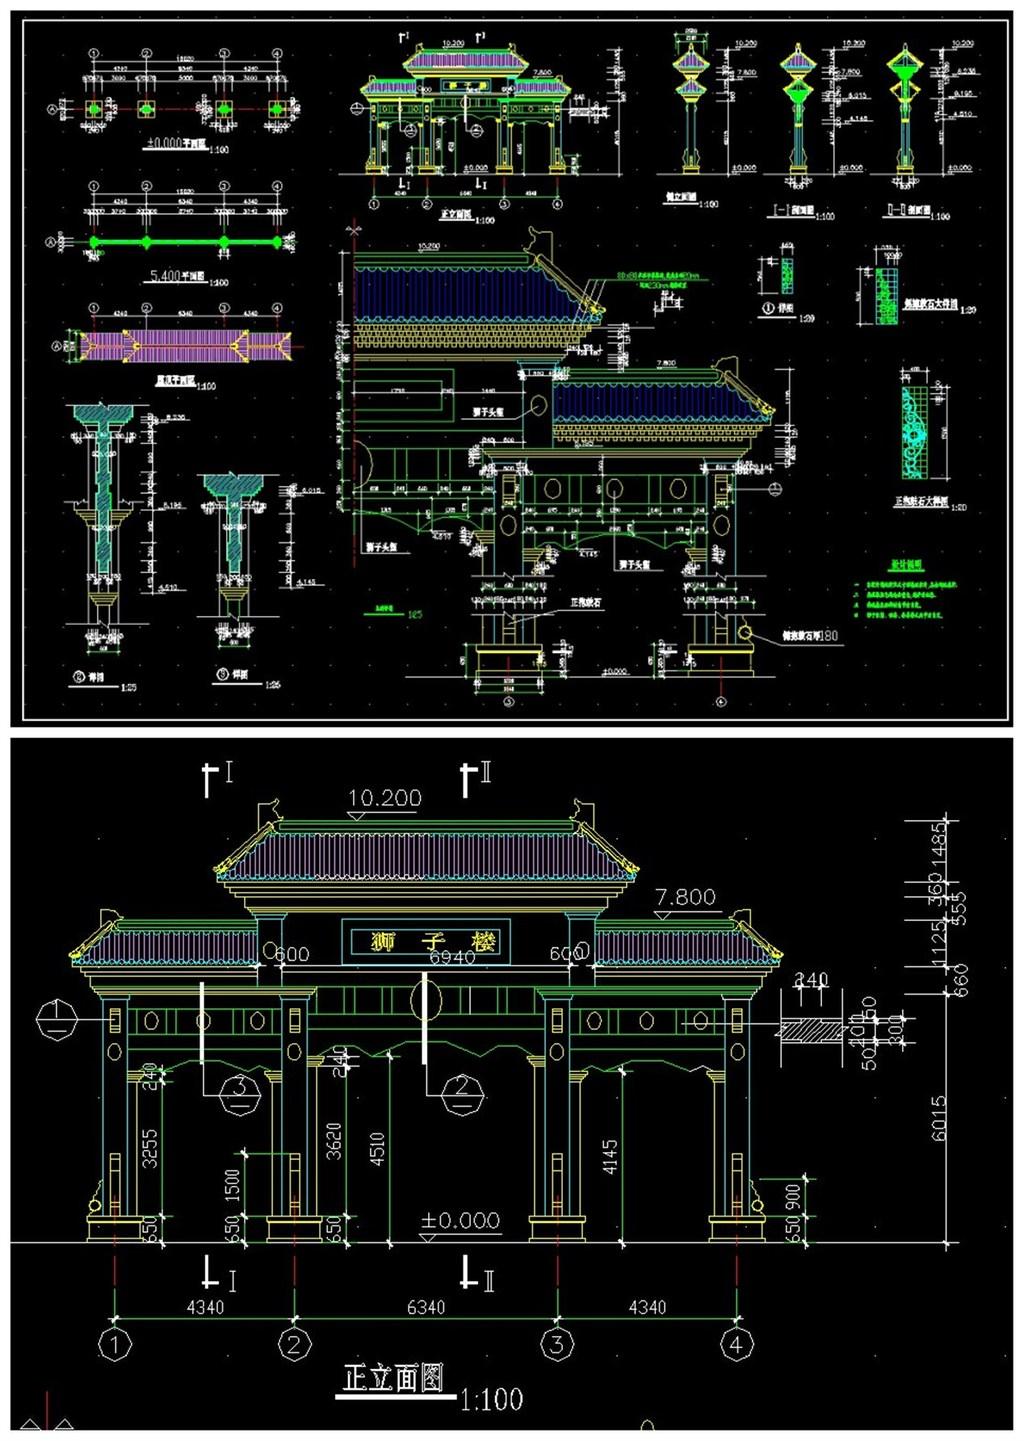 牌楼建筑cad施工图